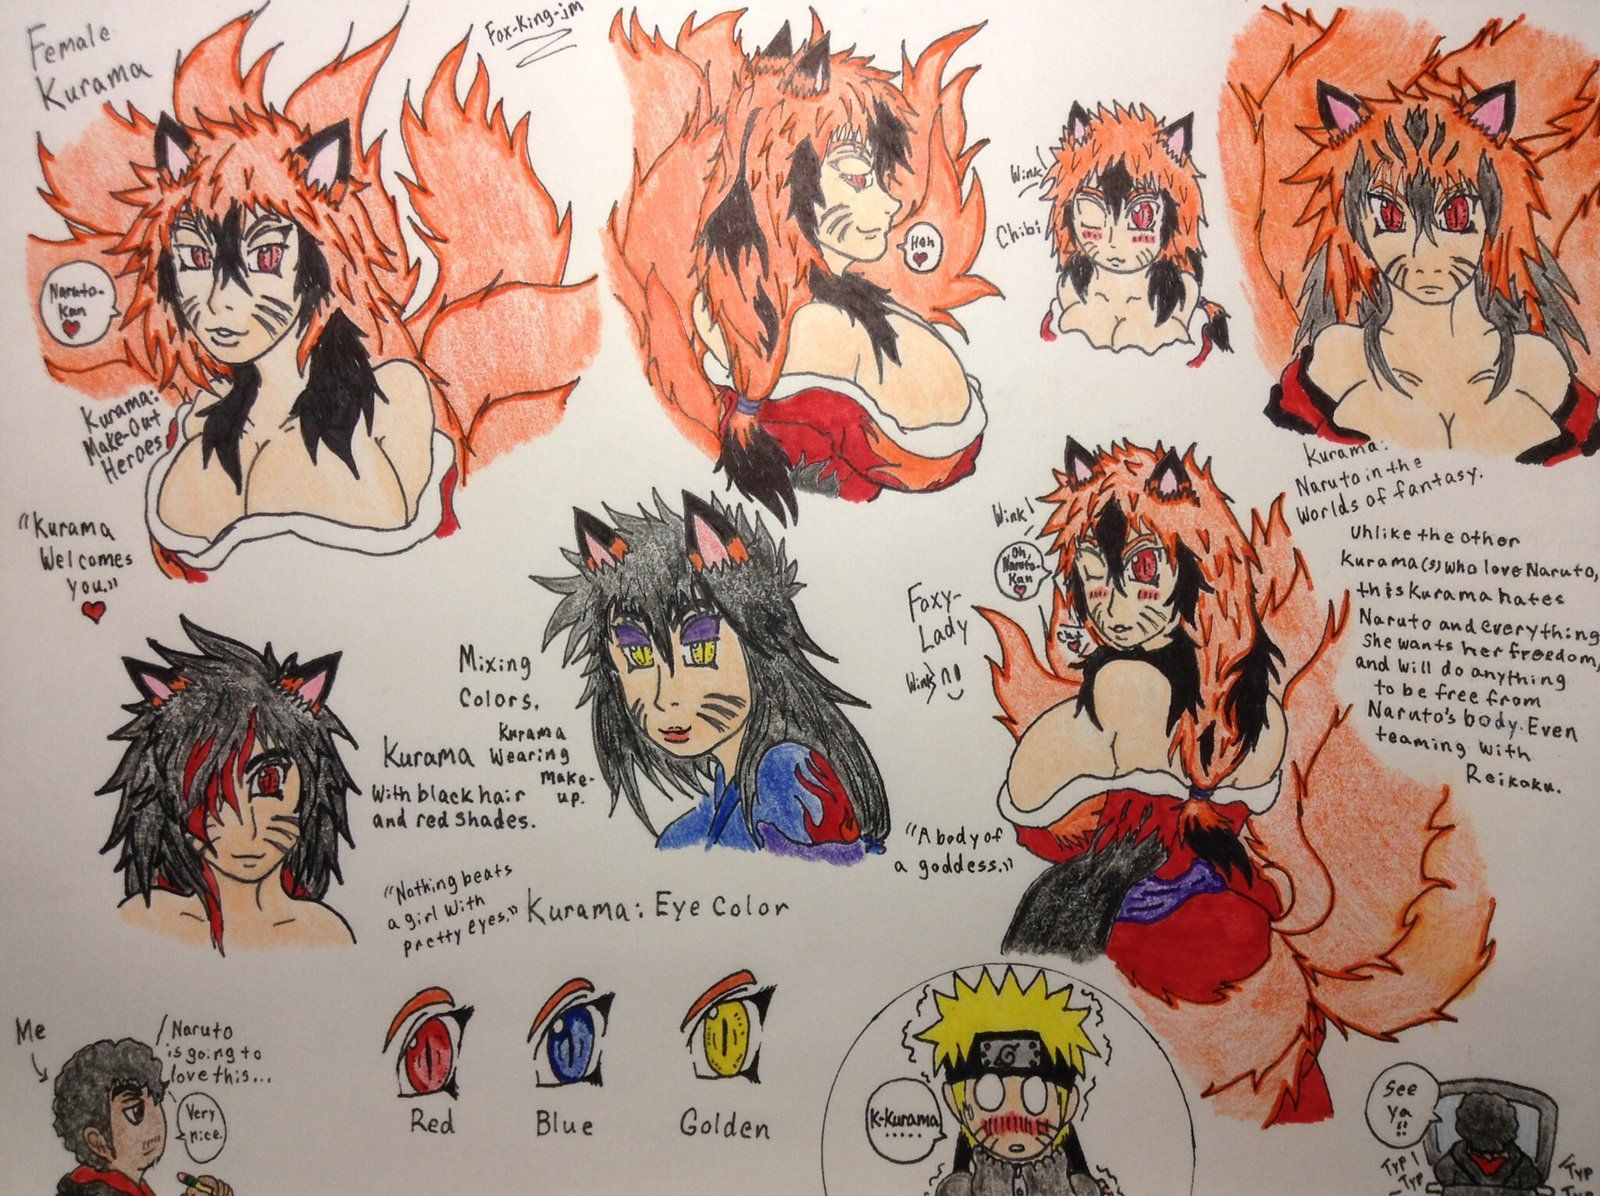 Naruto Kushina Kyuubi Lemon Fanfiction Naruto X Fem Kyuubi Fanfic